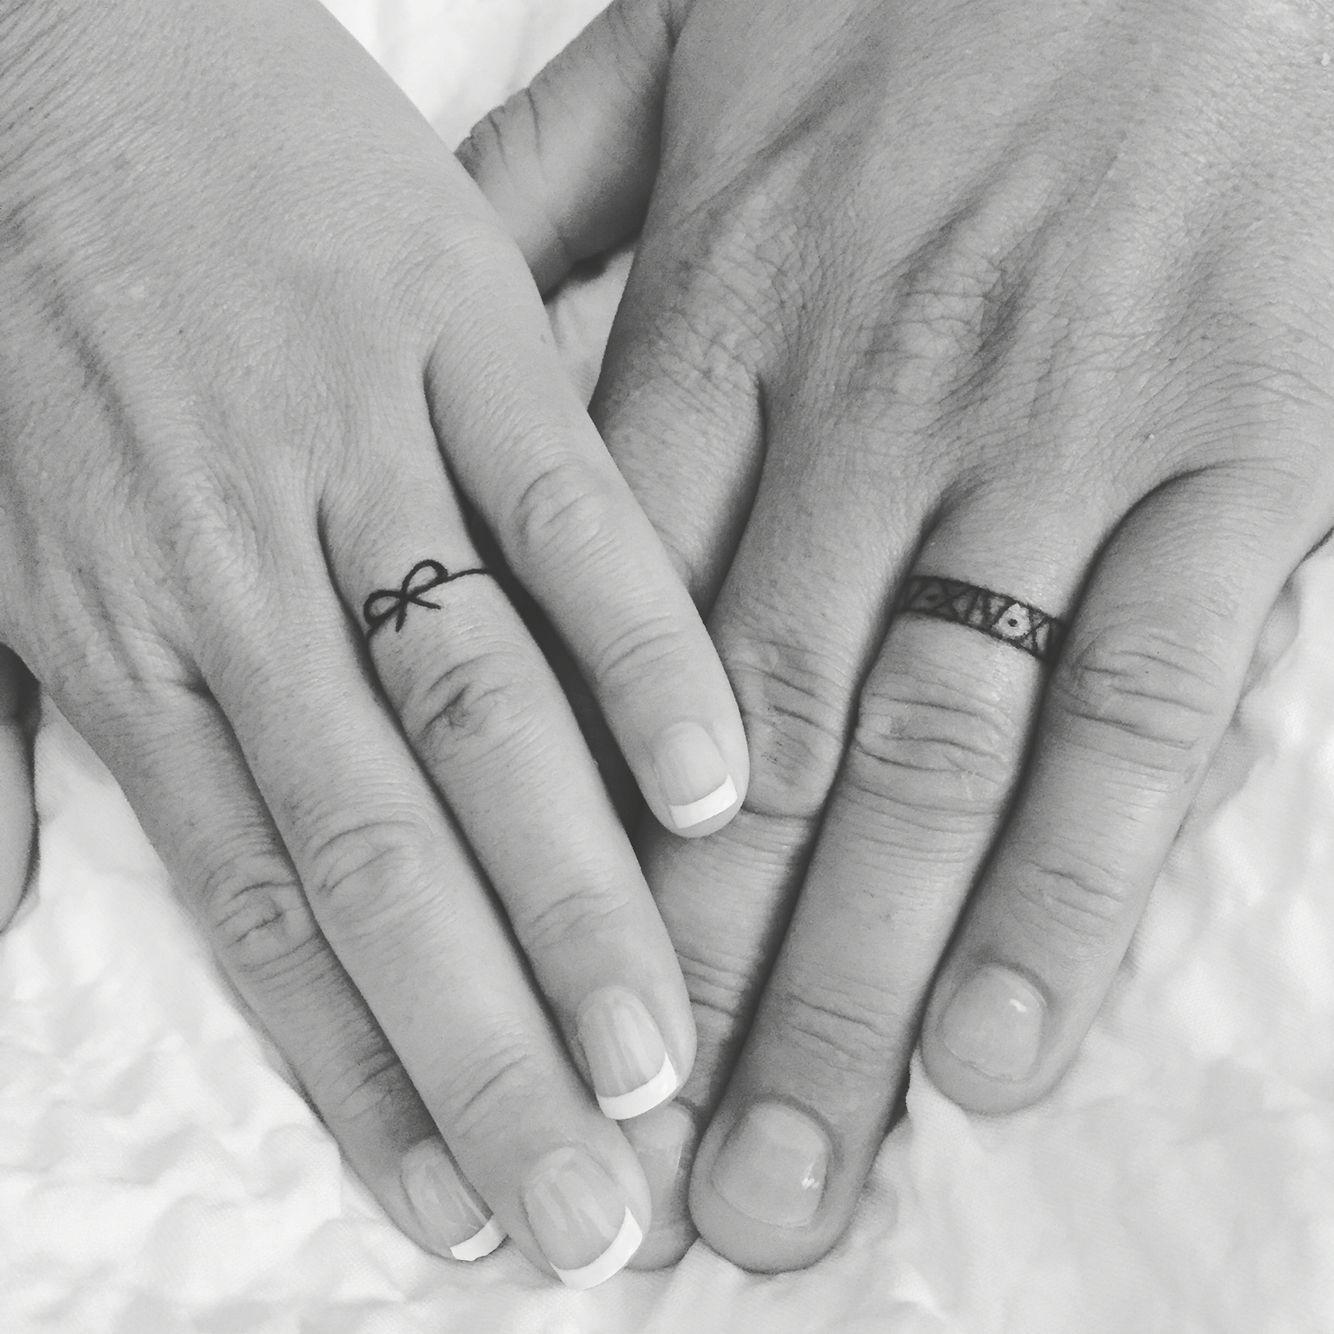 Husband And Wife Wedding Band Tattoos